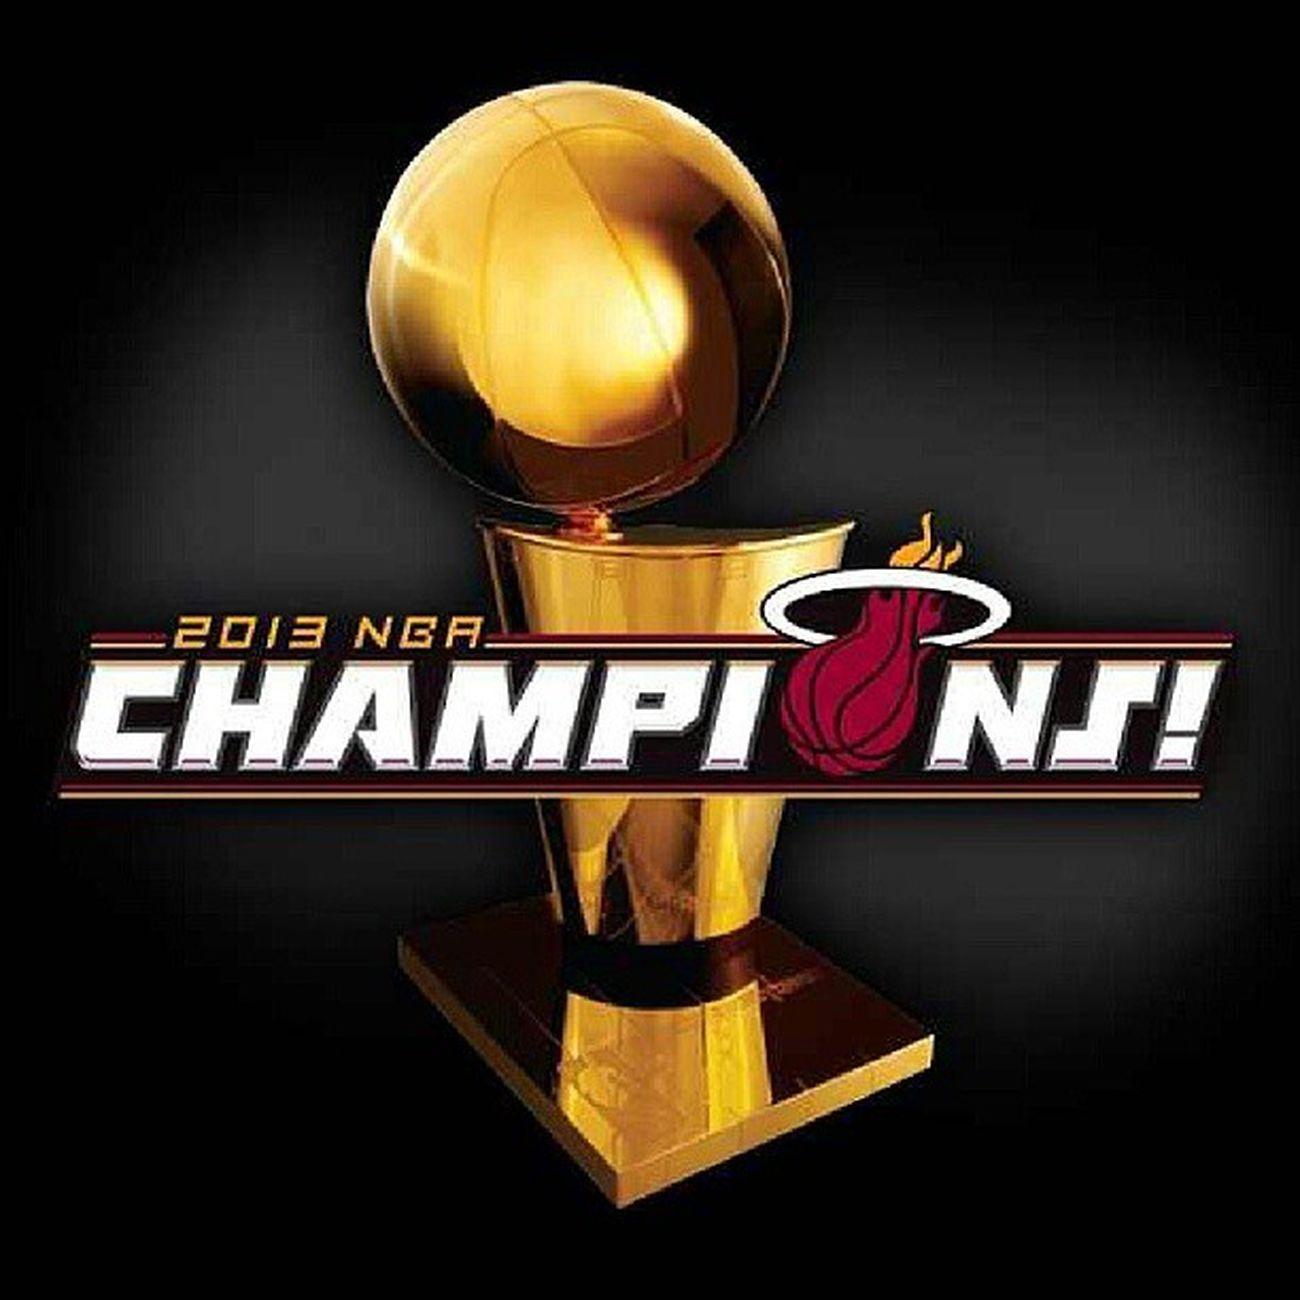 2013 NBA champions Repeat HEATREPEAT